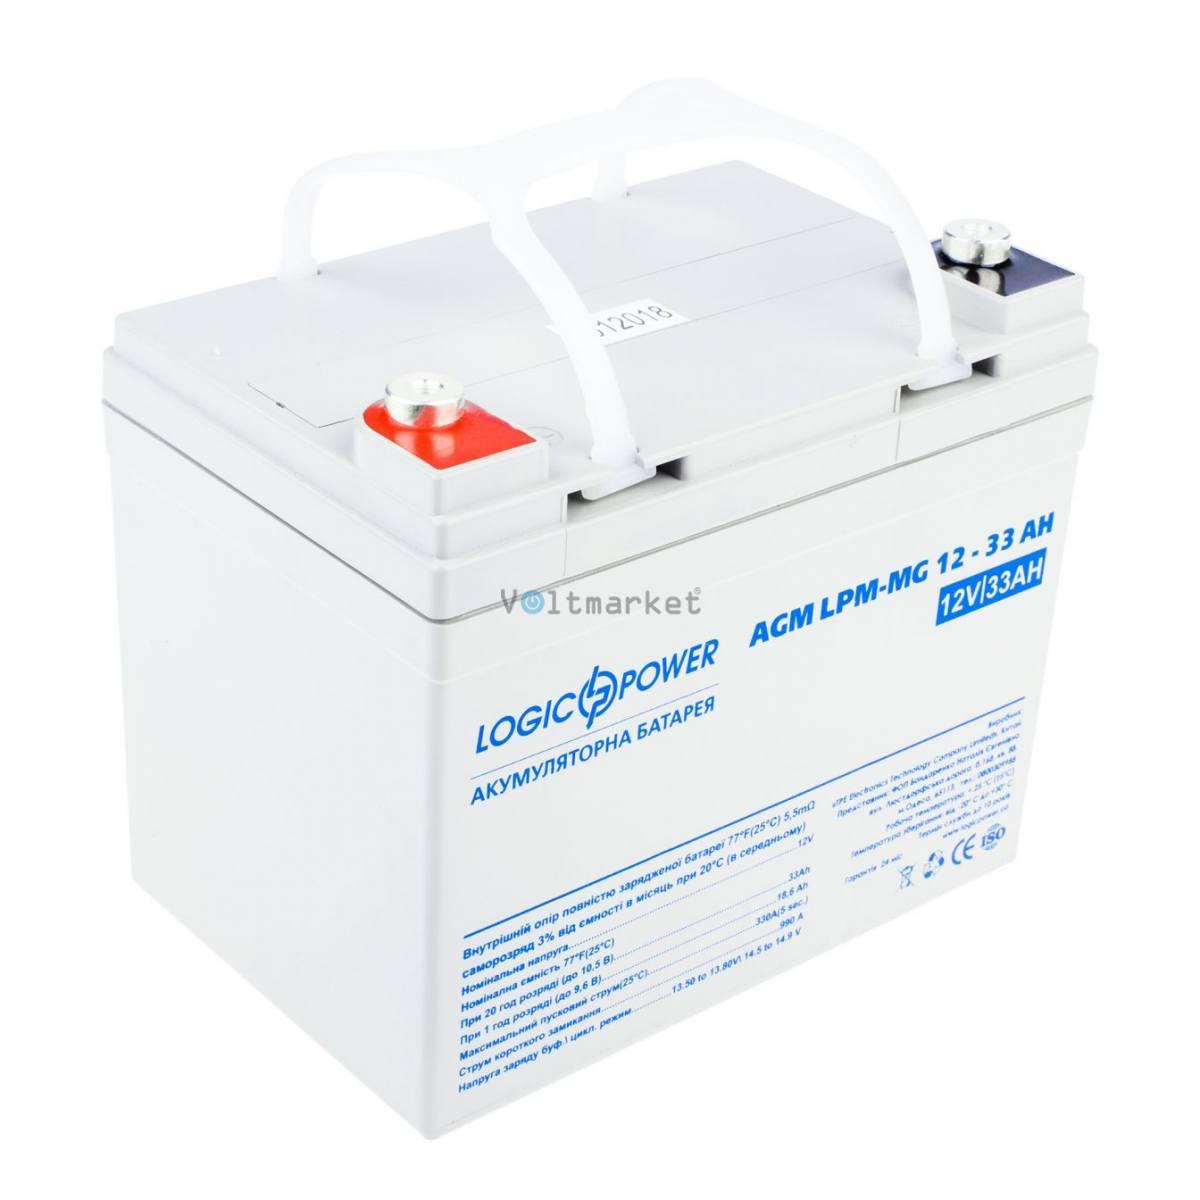 Мультигелевые аккумуляторные батареи LOGICPOWER LP-MG 12V 33AH